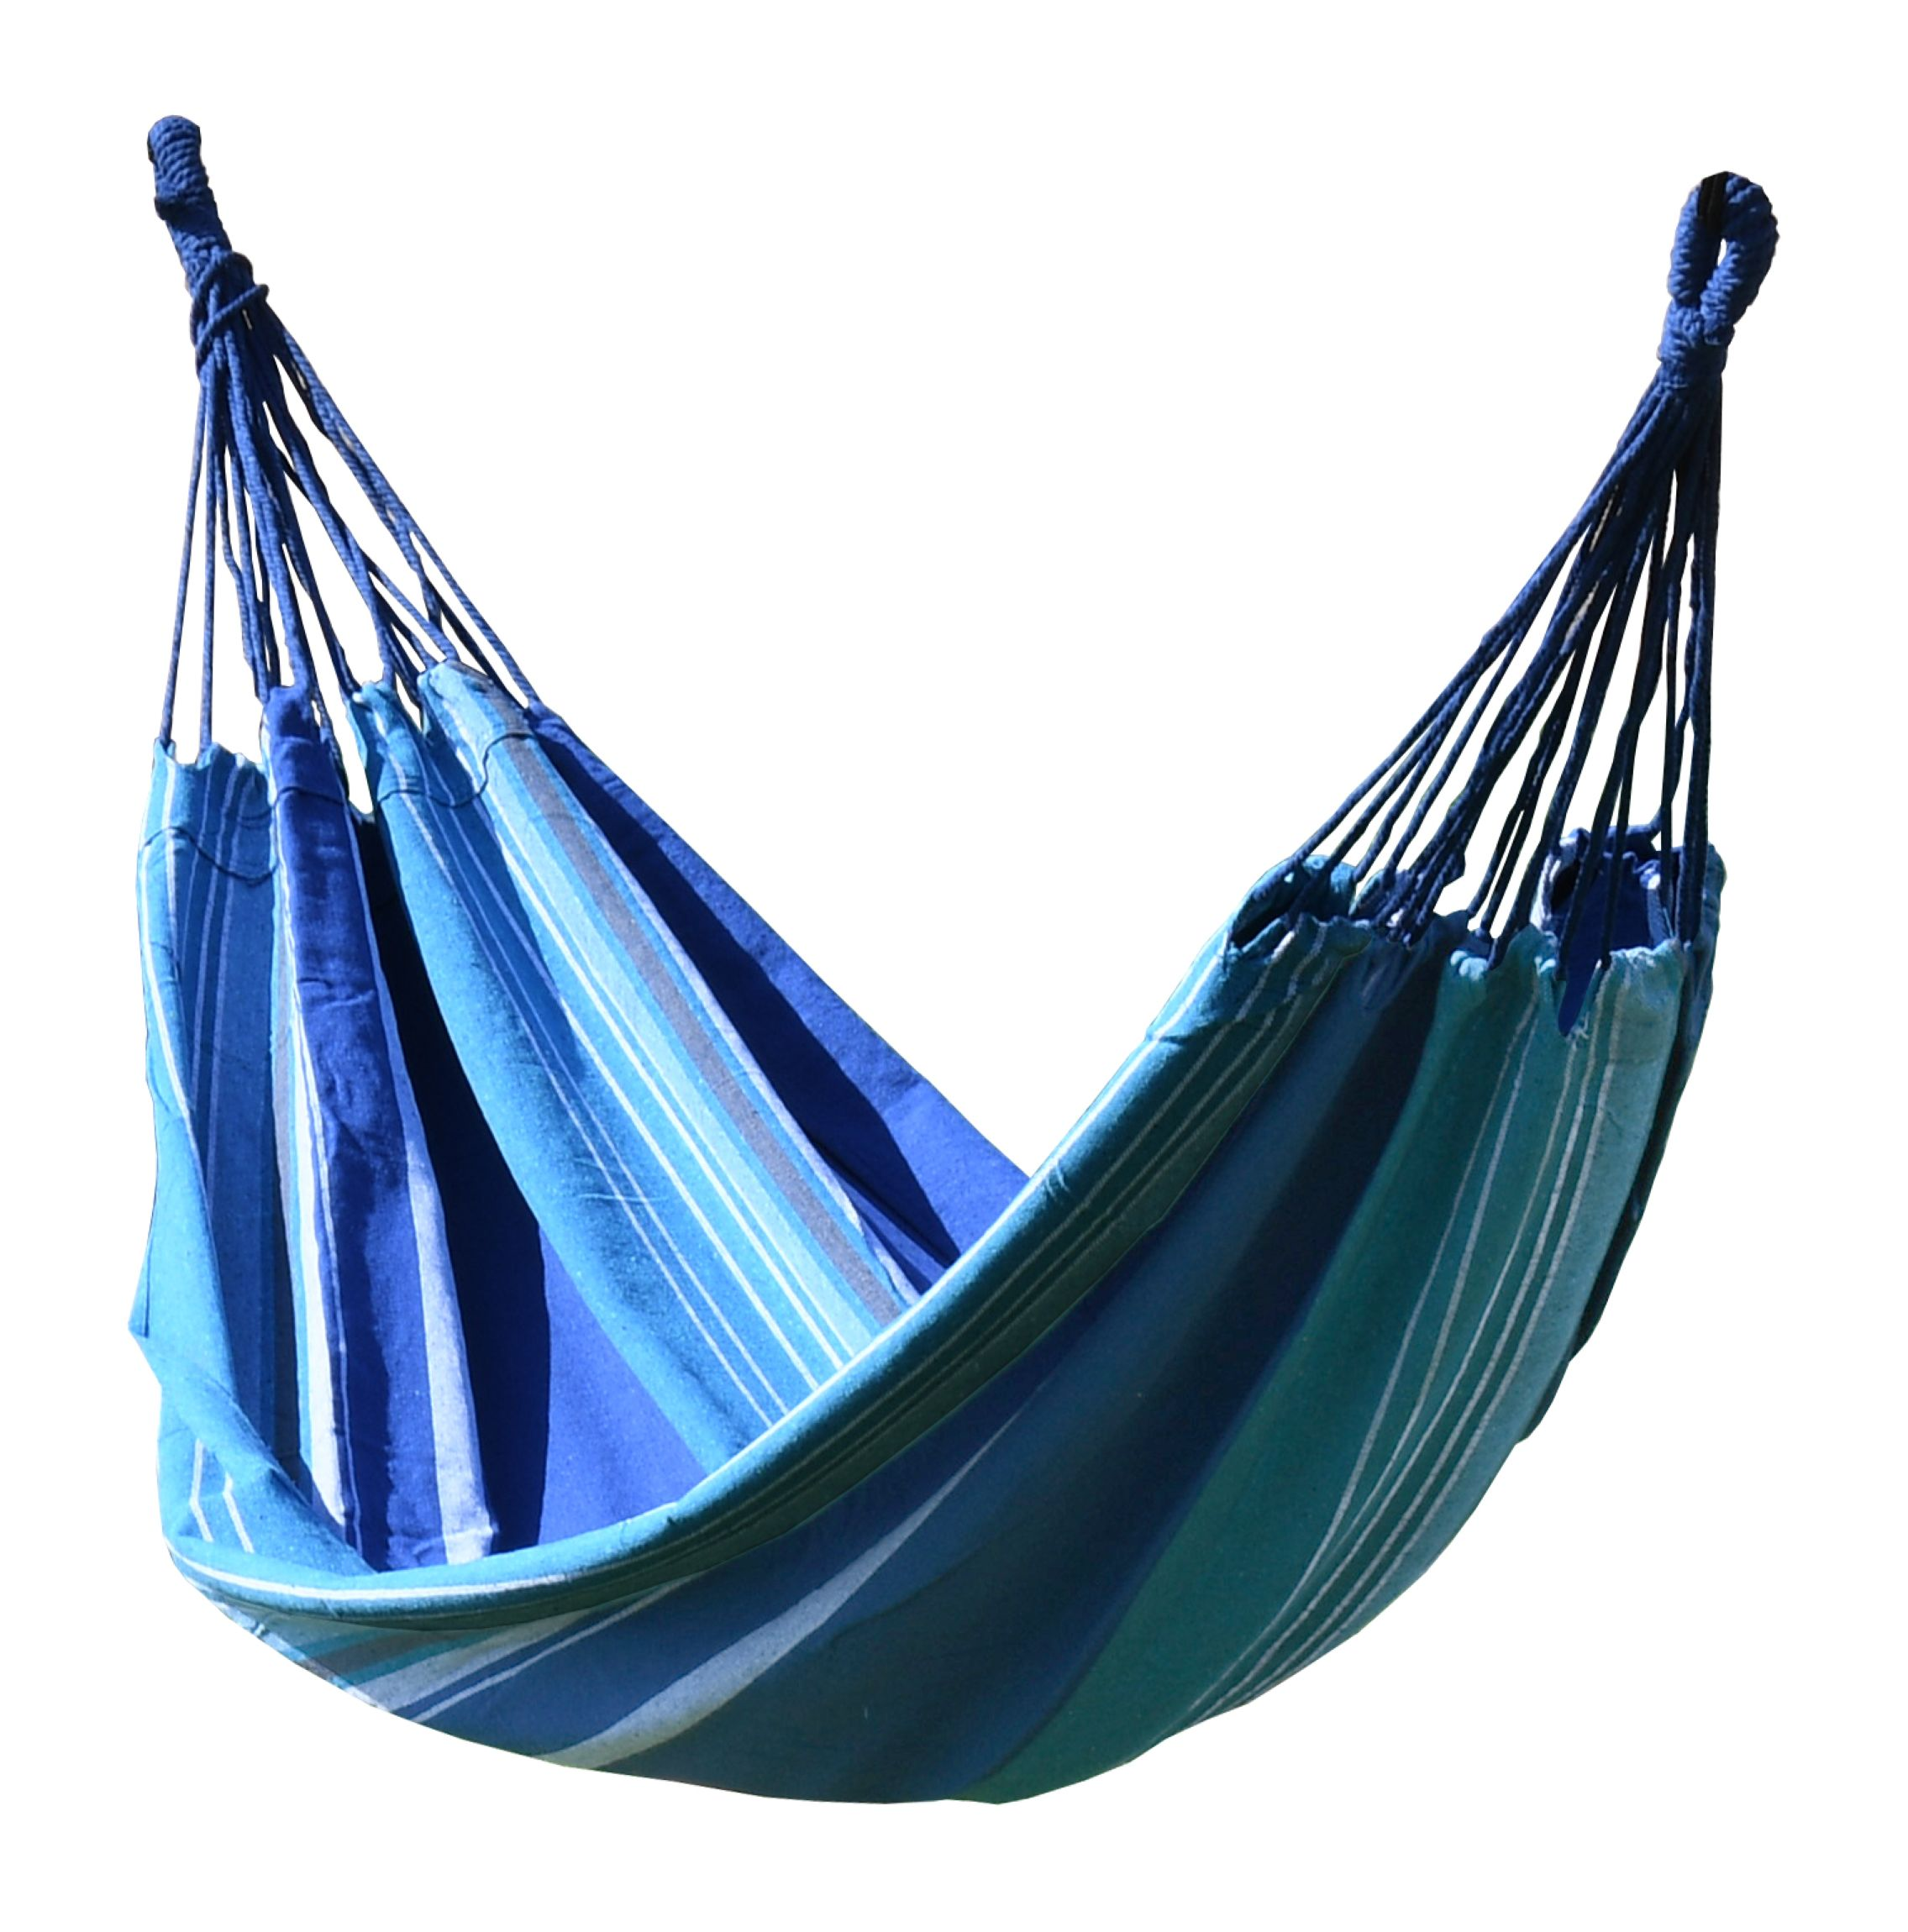 Cattara - Houpací síť TEXTIL 200x100cm modro-bílá